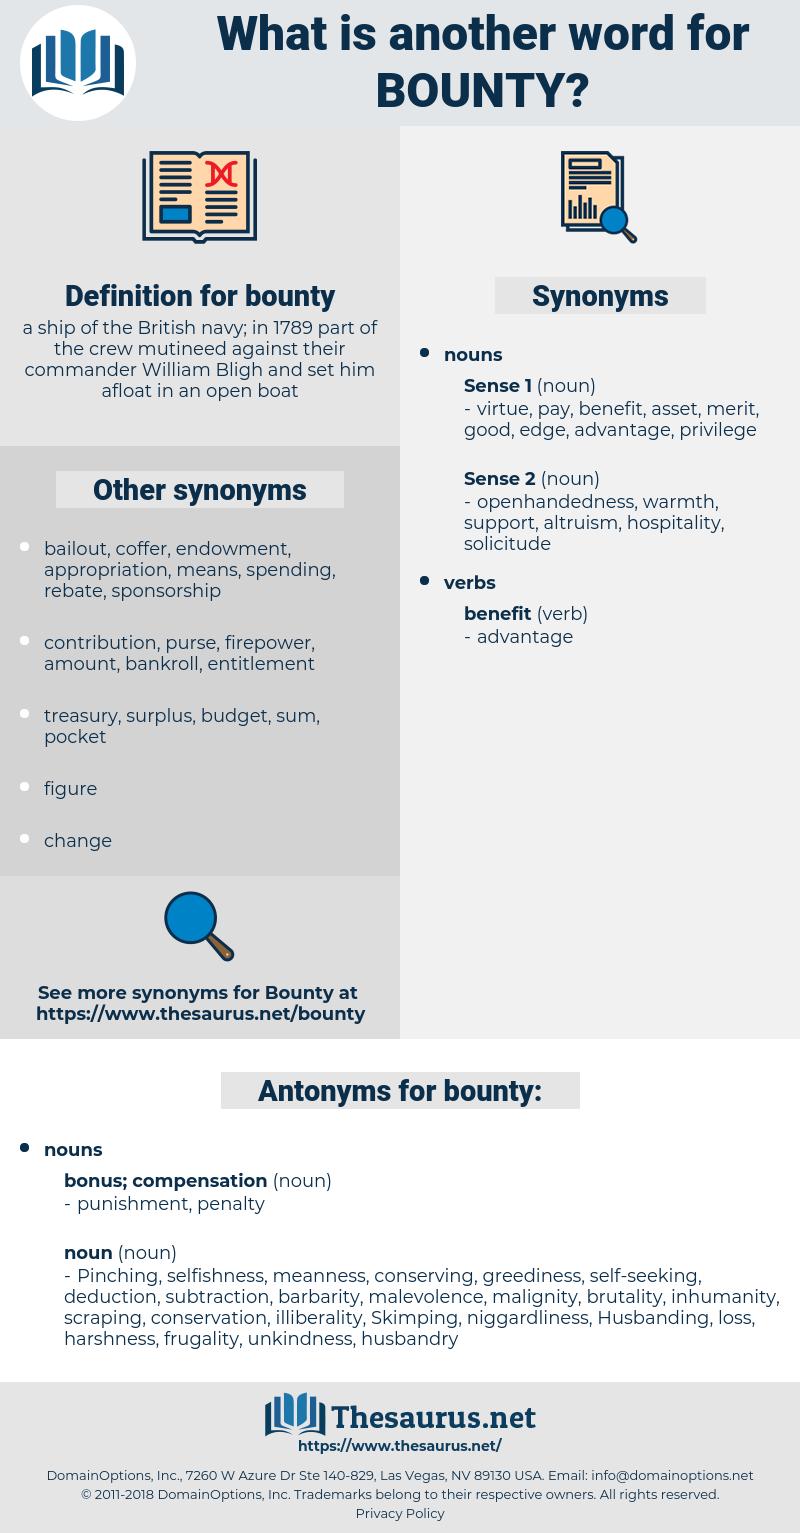 bounty, synonym bounty, another word for bounty, words like bounty, thesaurus bounty